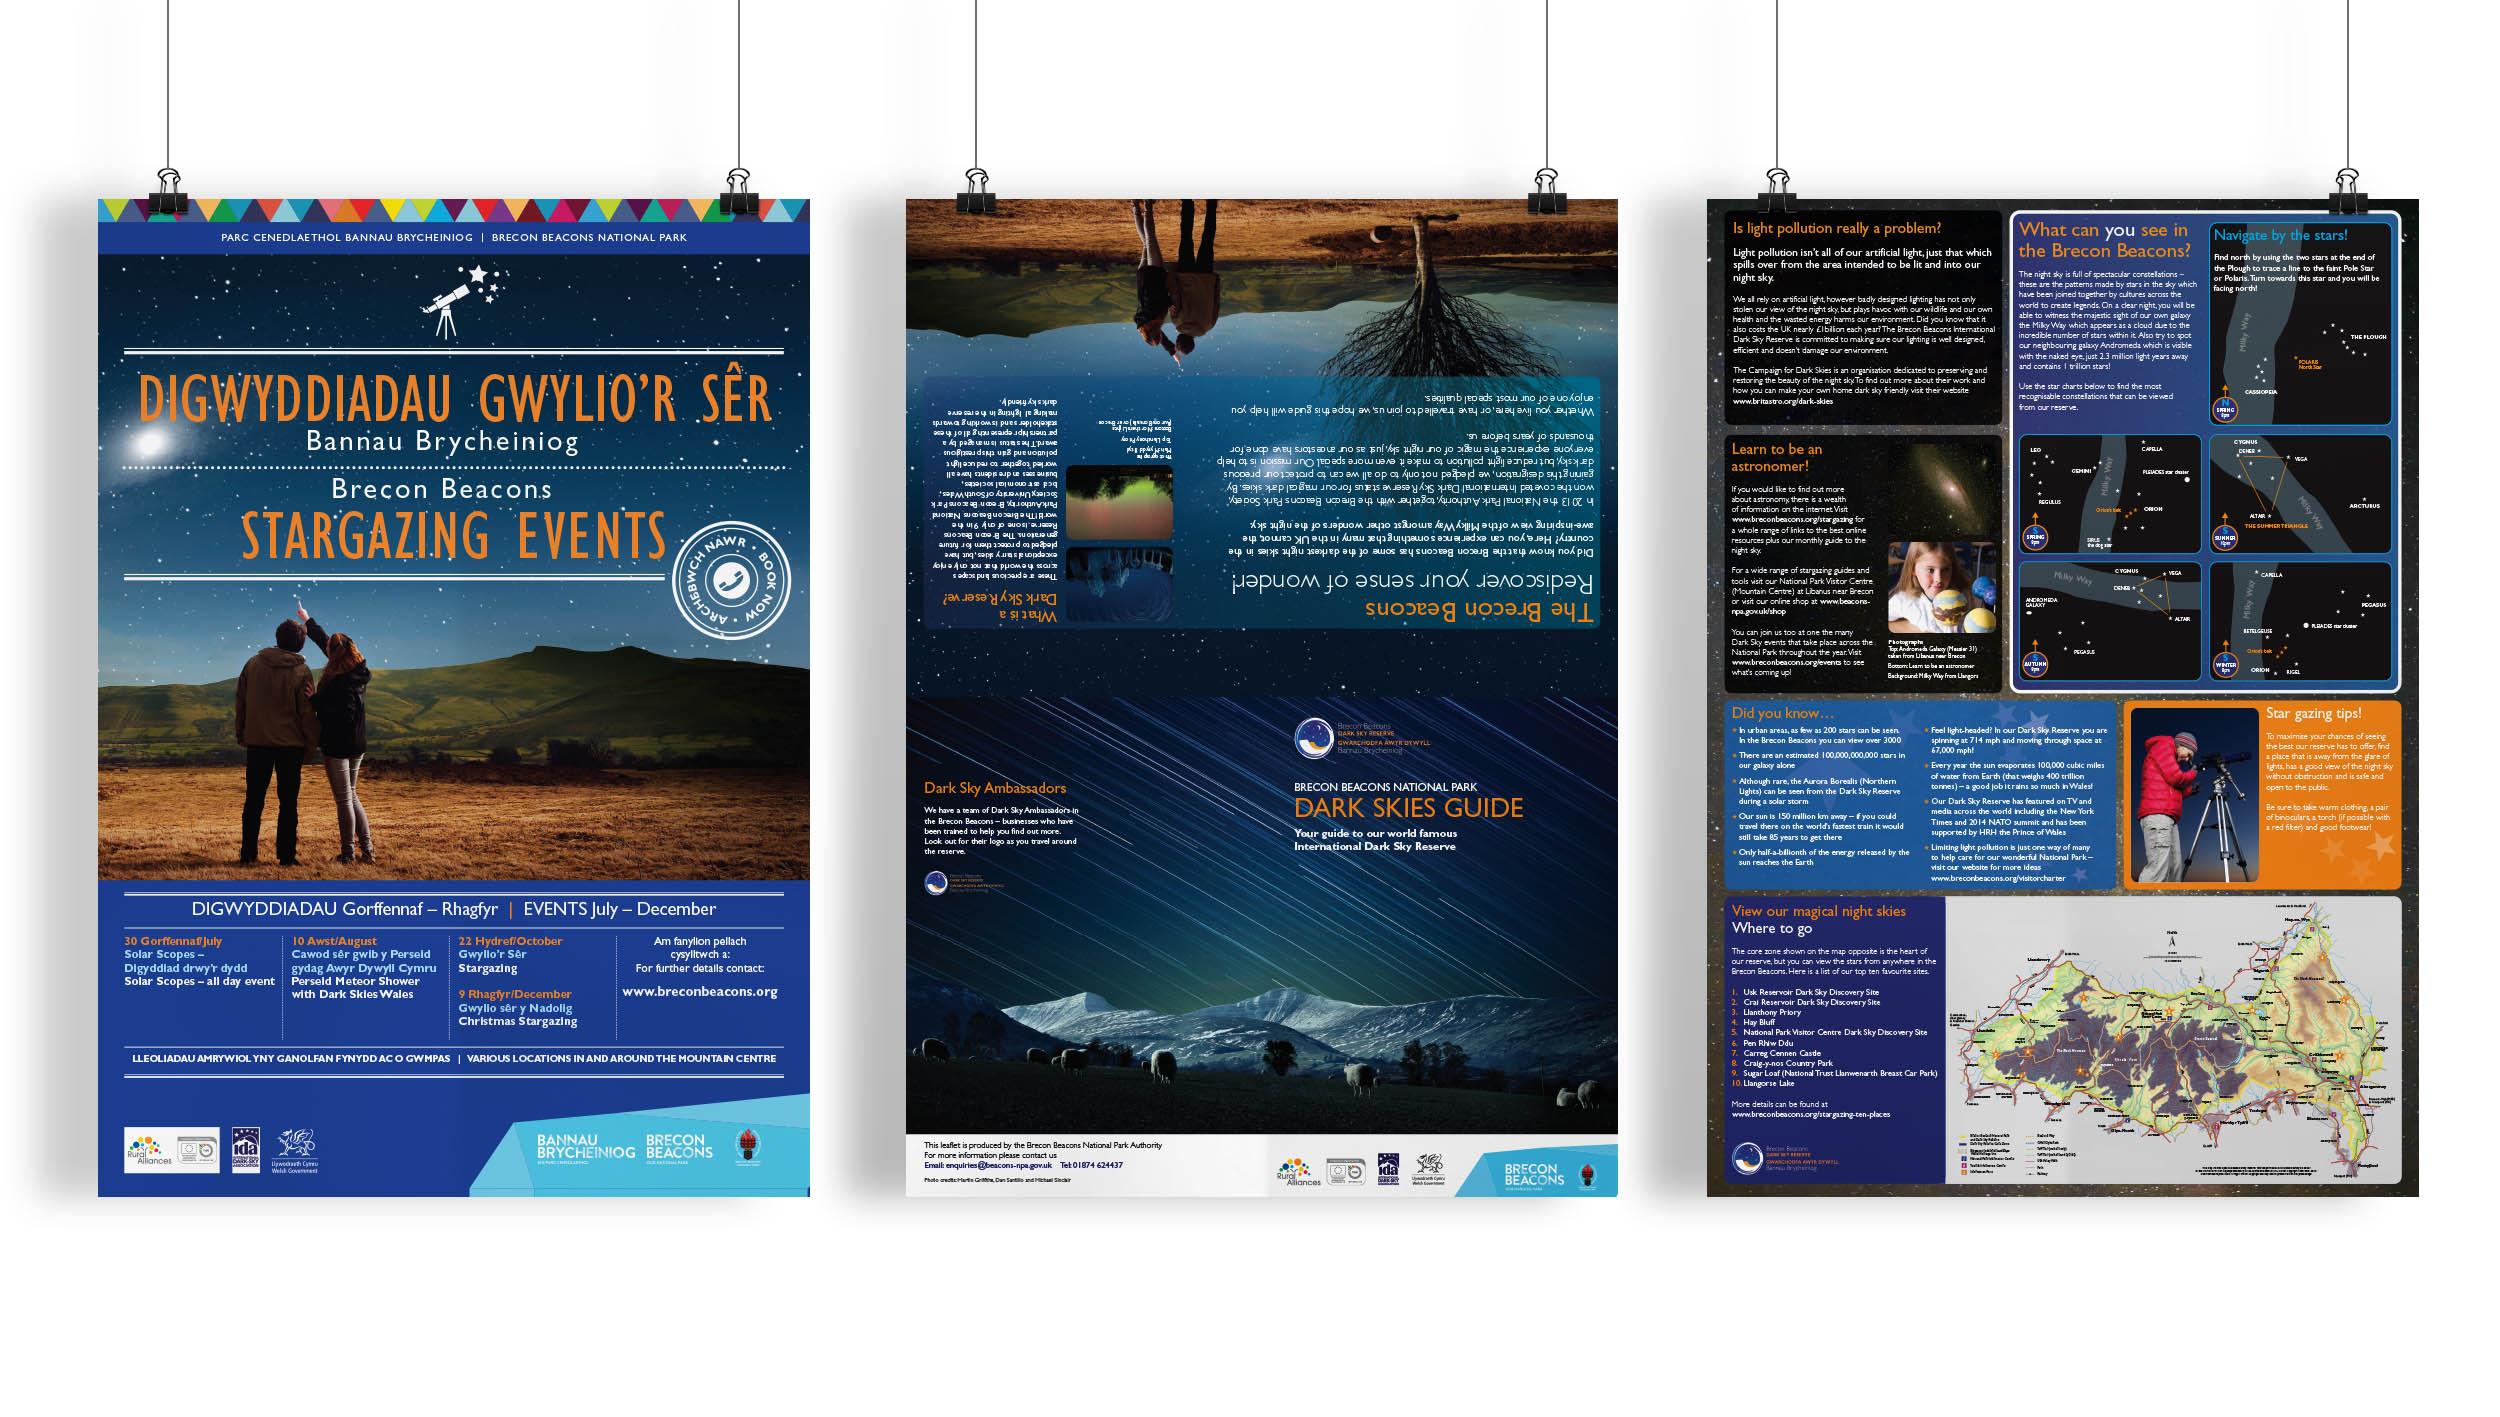 brecon-beacons-darksky-posters.jpg